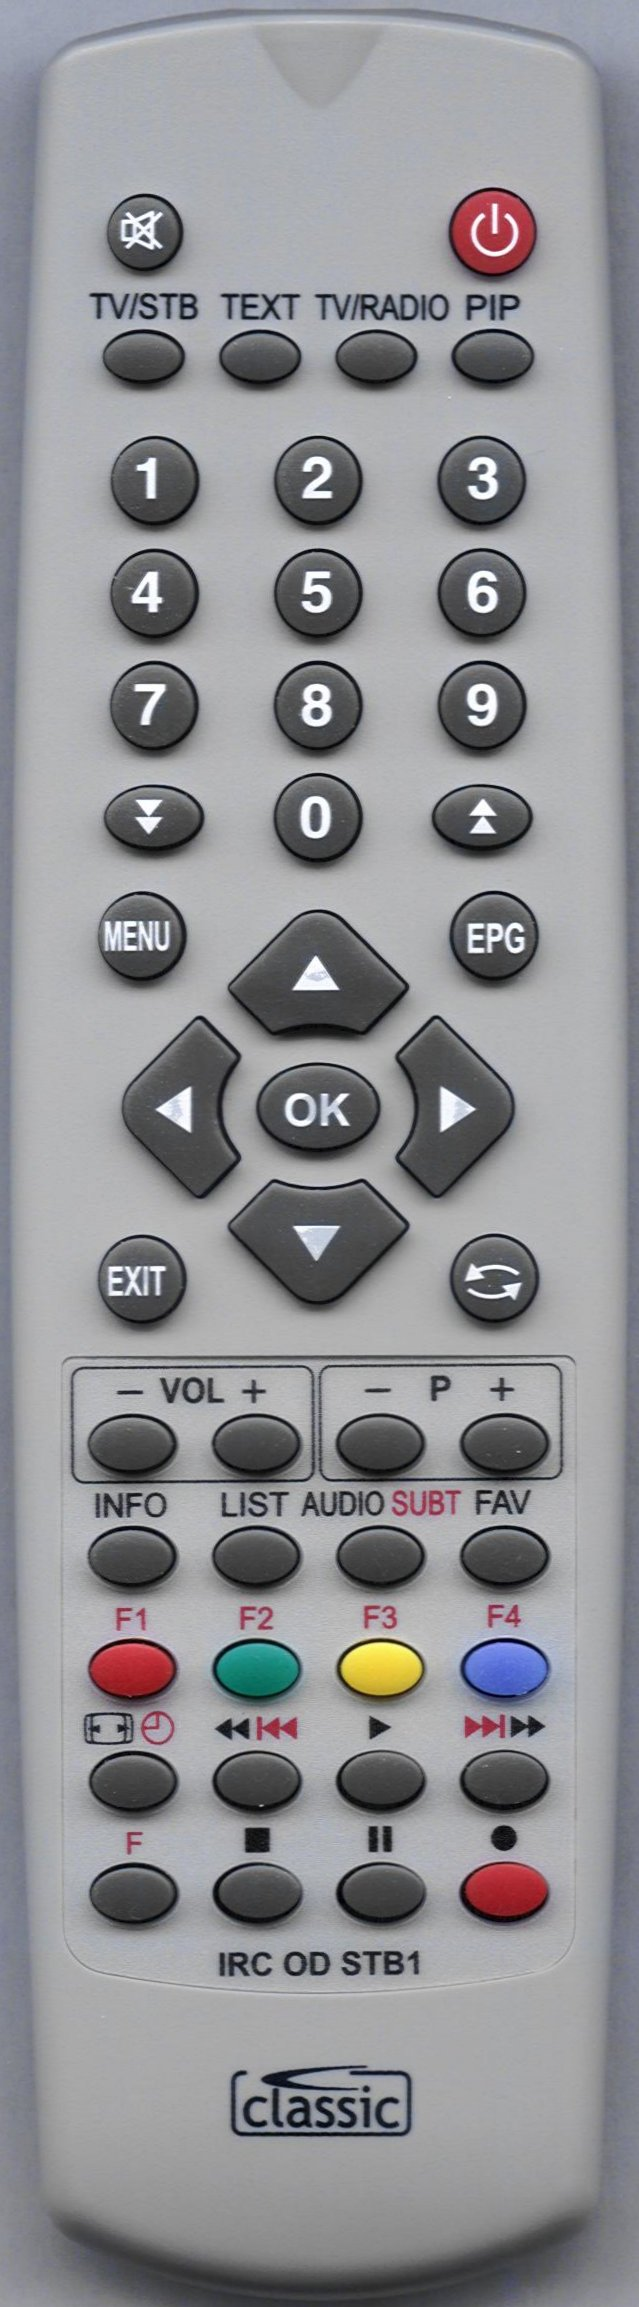 LOGISAT RG405 DS4 Remote Control